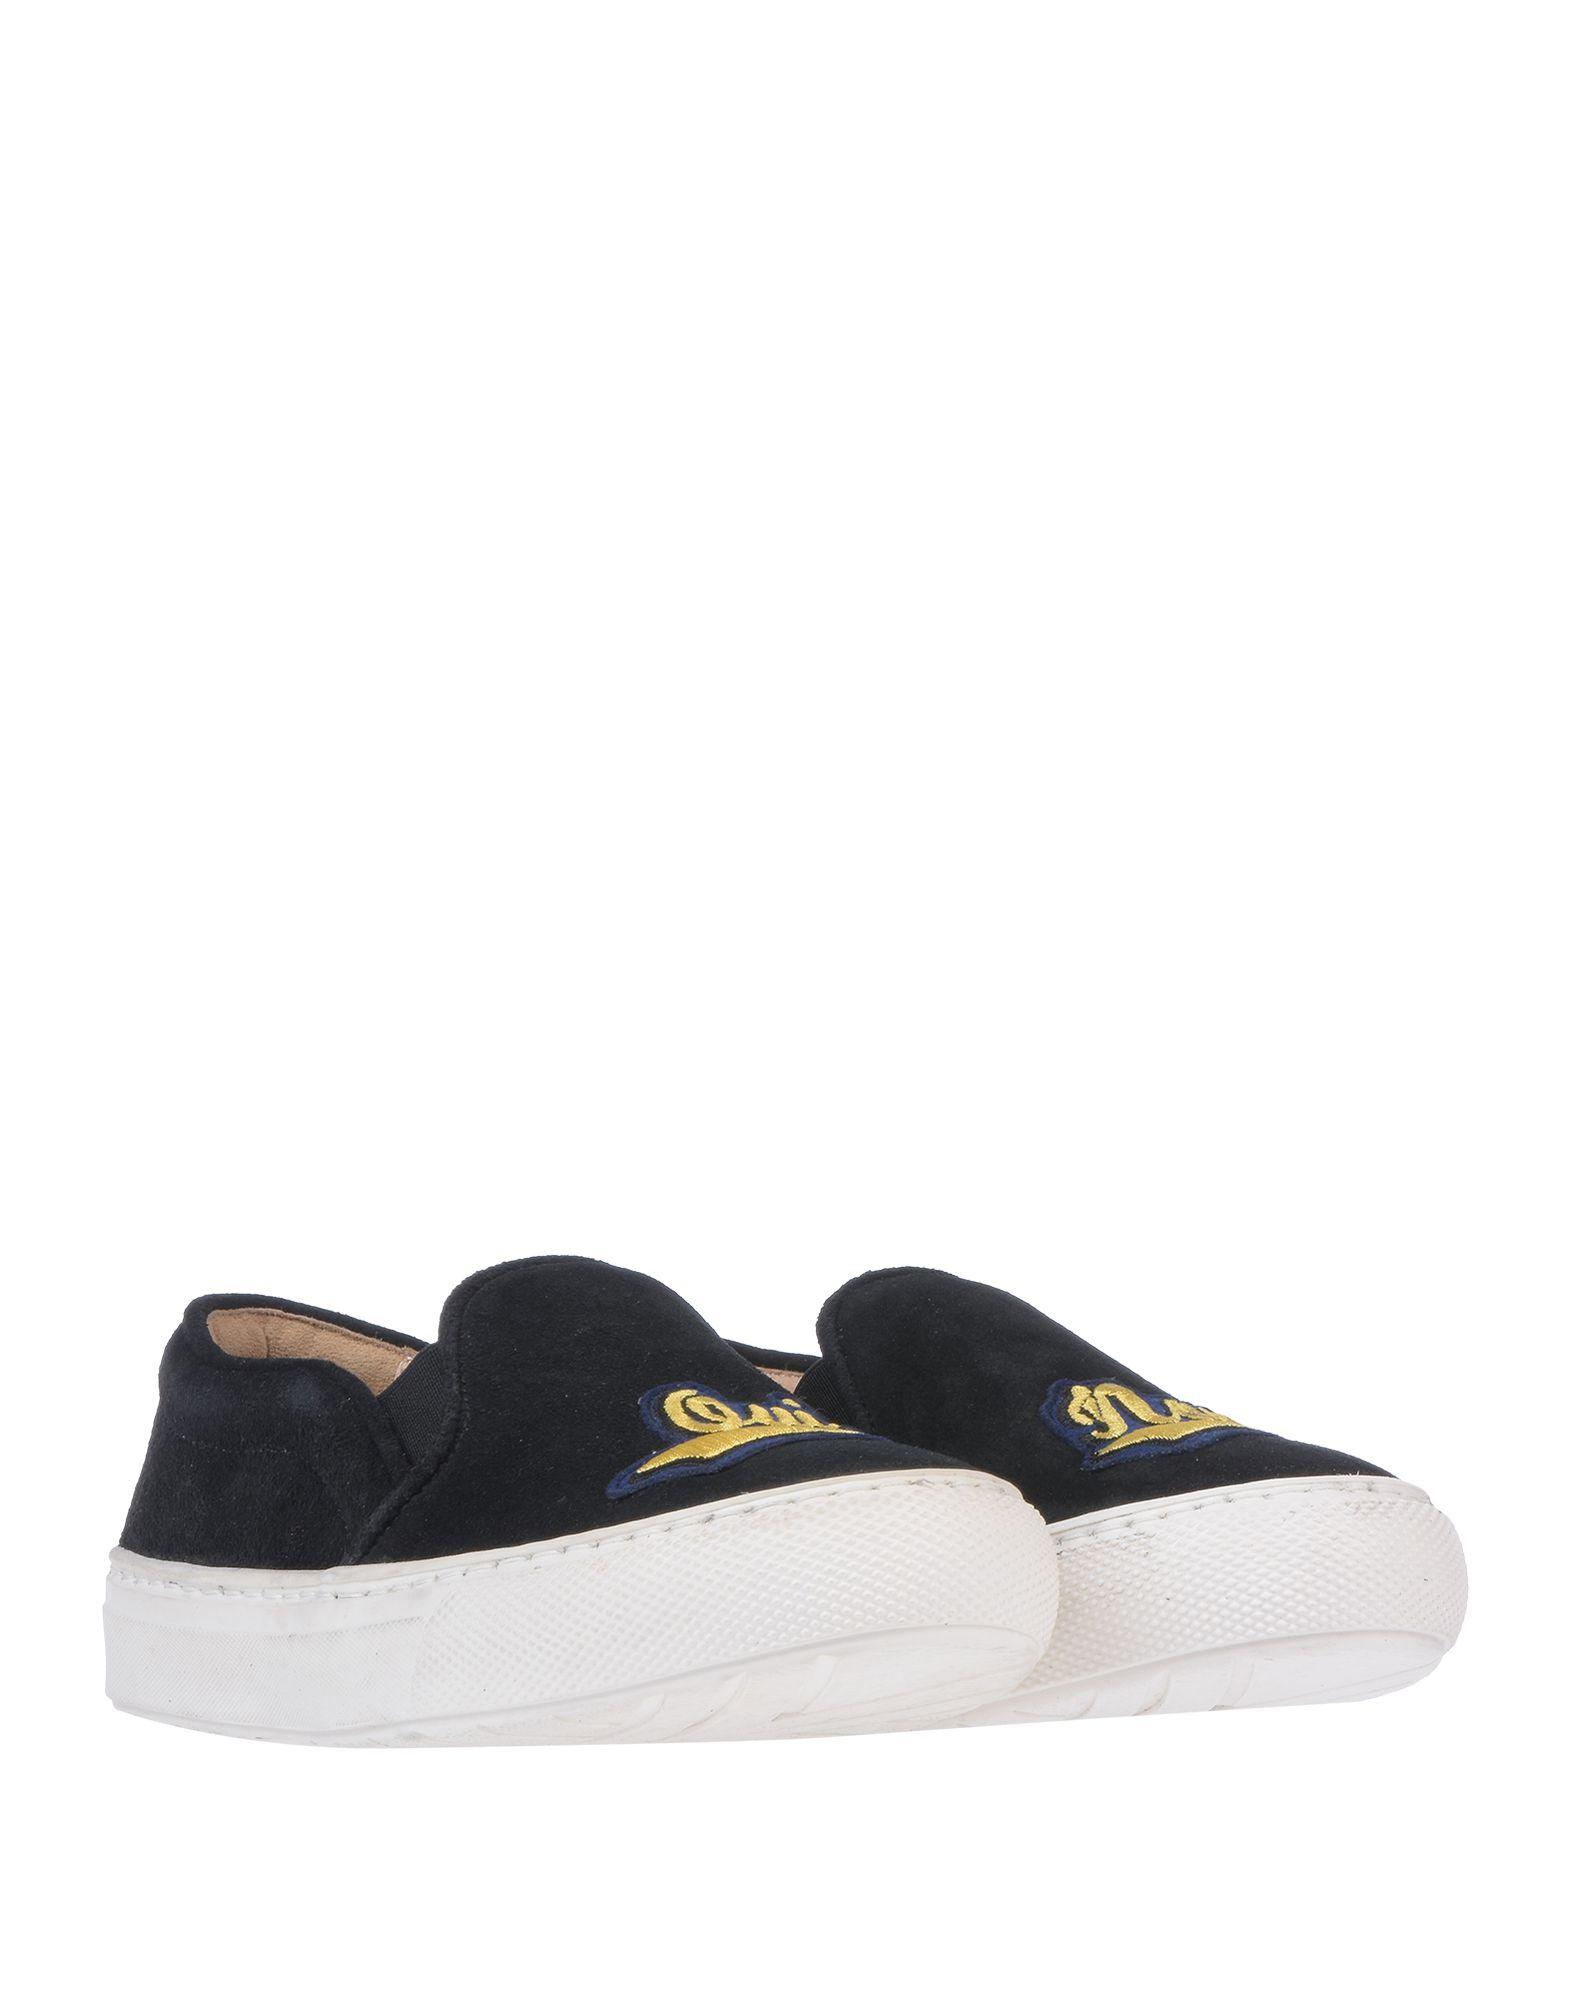 Markus Lupfer Sneakers Damen   11318451CM bc4eeb